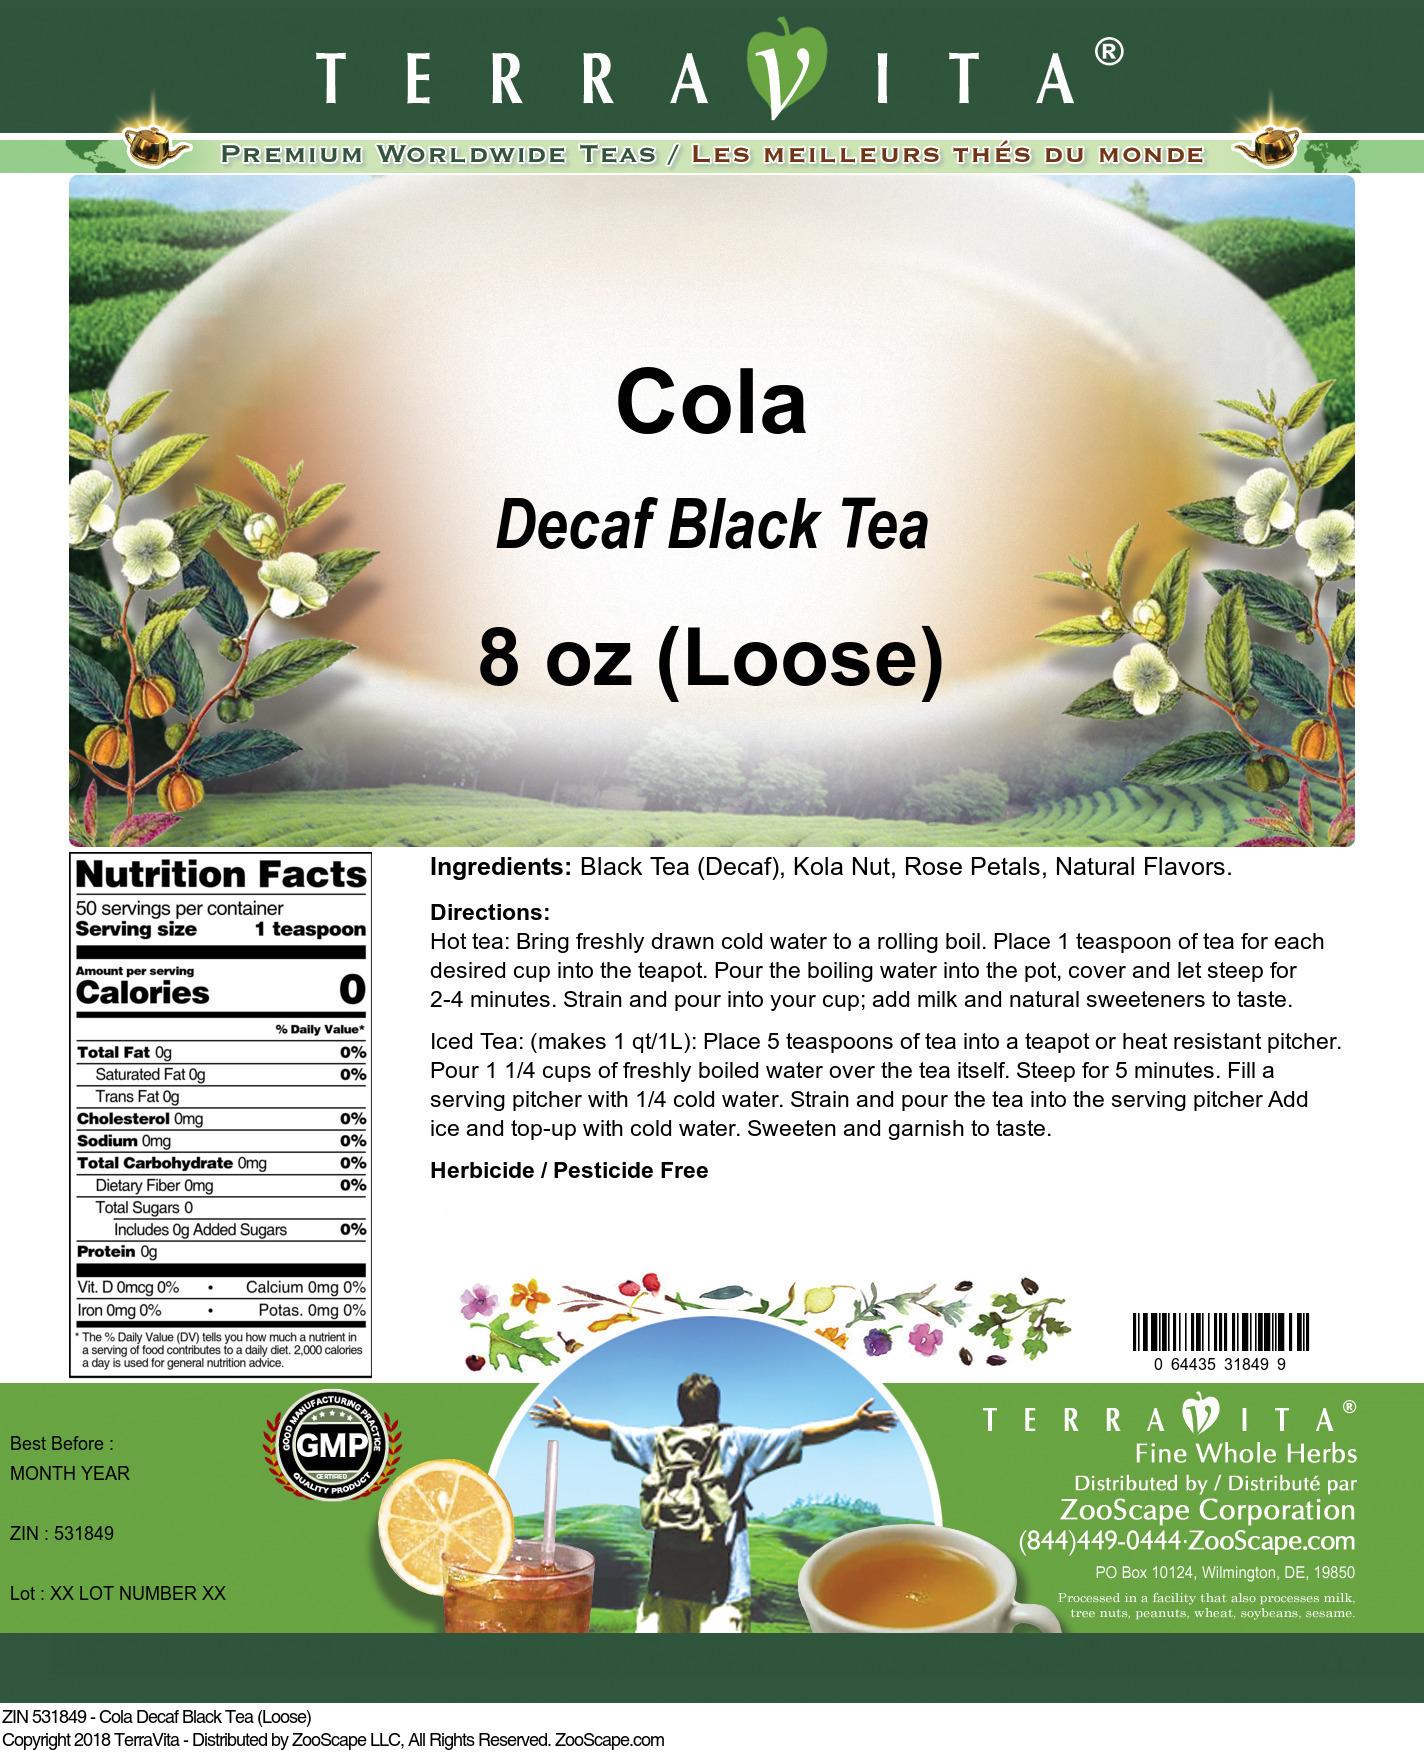 Cola Decaf Black Tea (Loose)